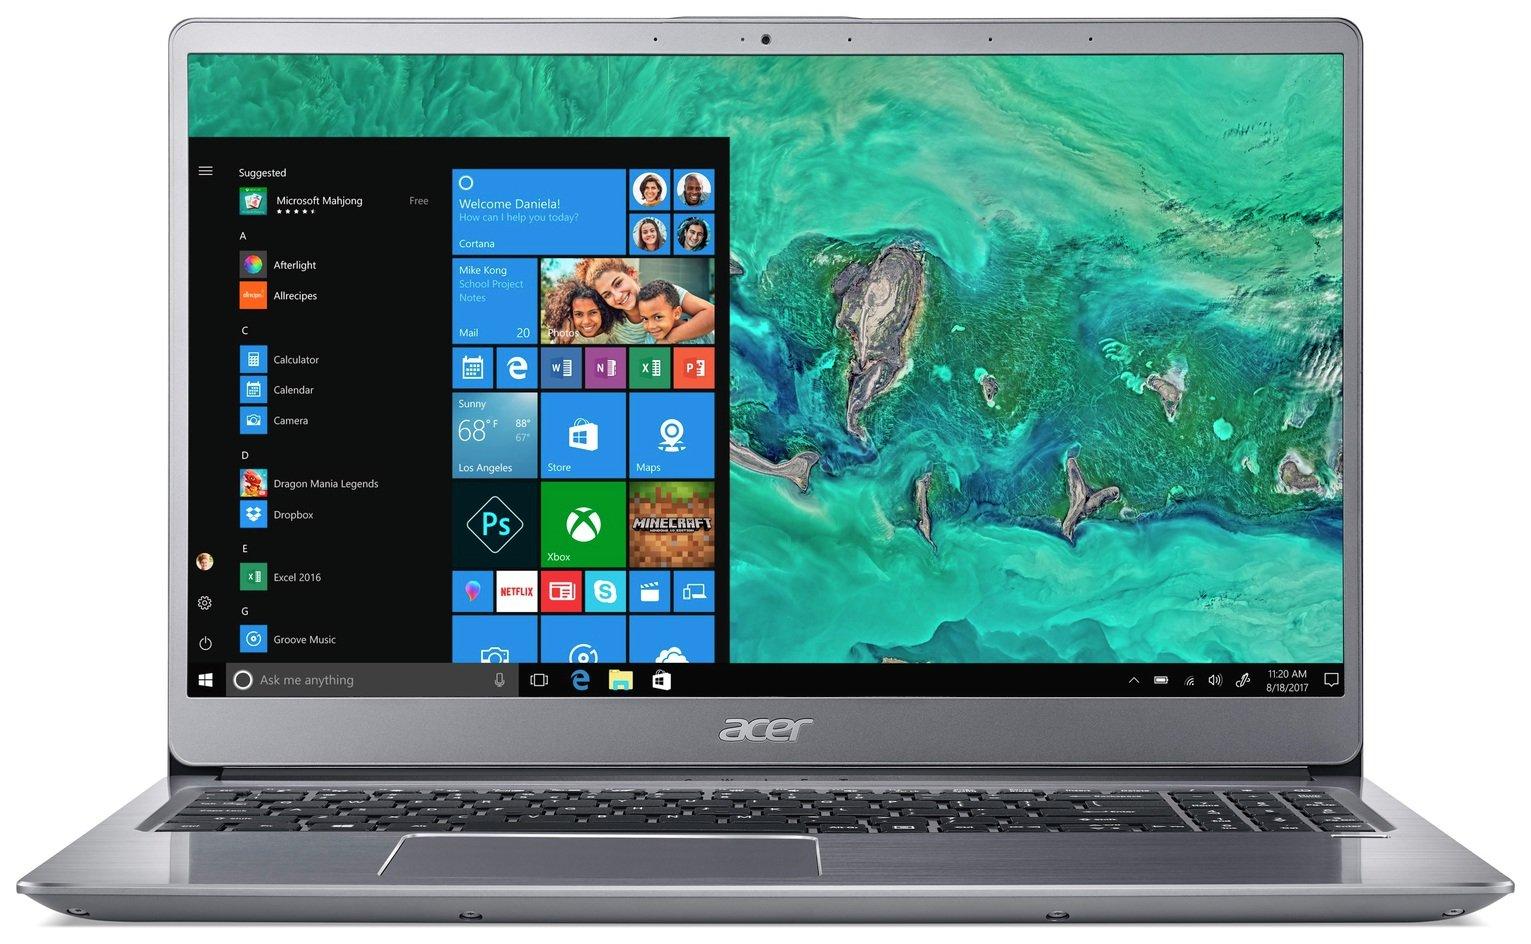 Acer Swift 3 15.6 Inch i3 4GB 256GB FHD Laptop - Silver